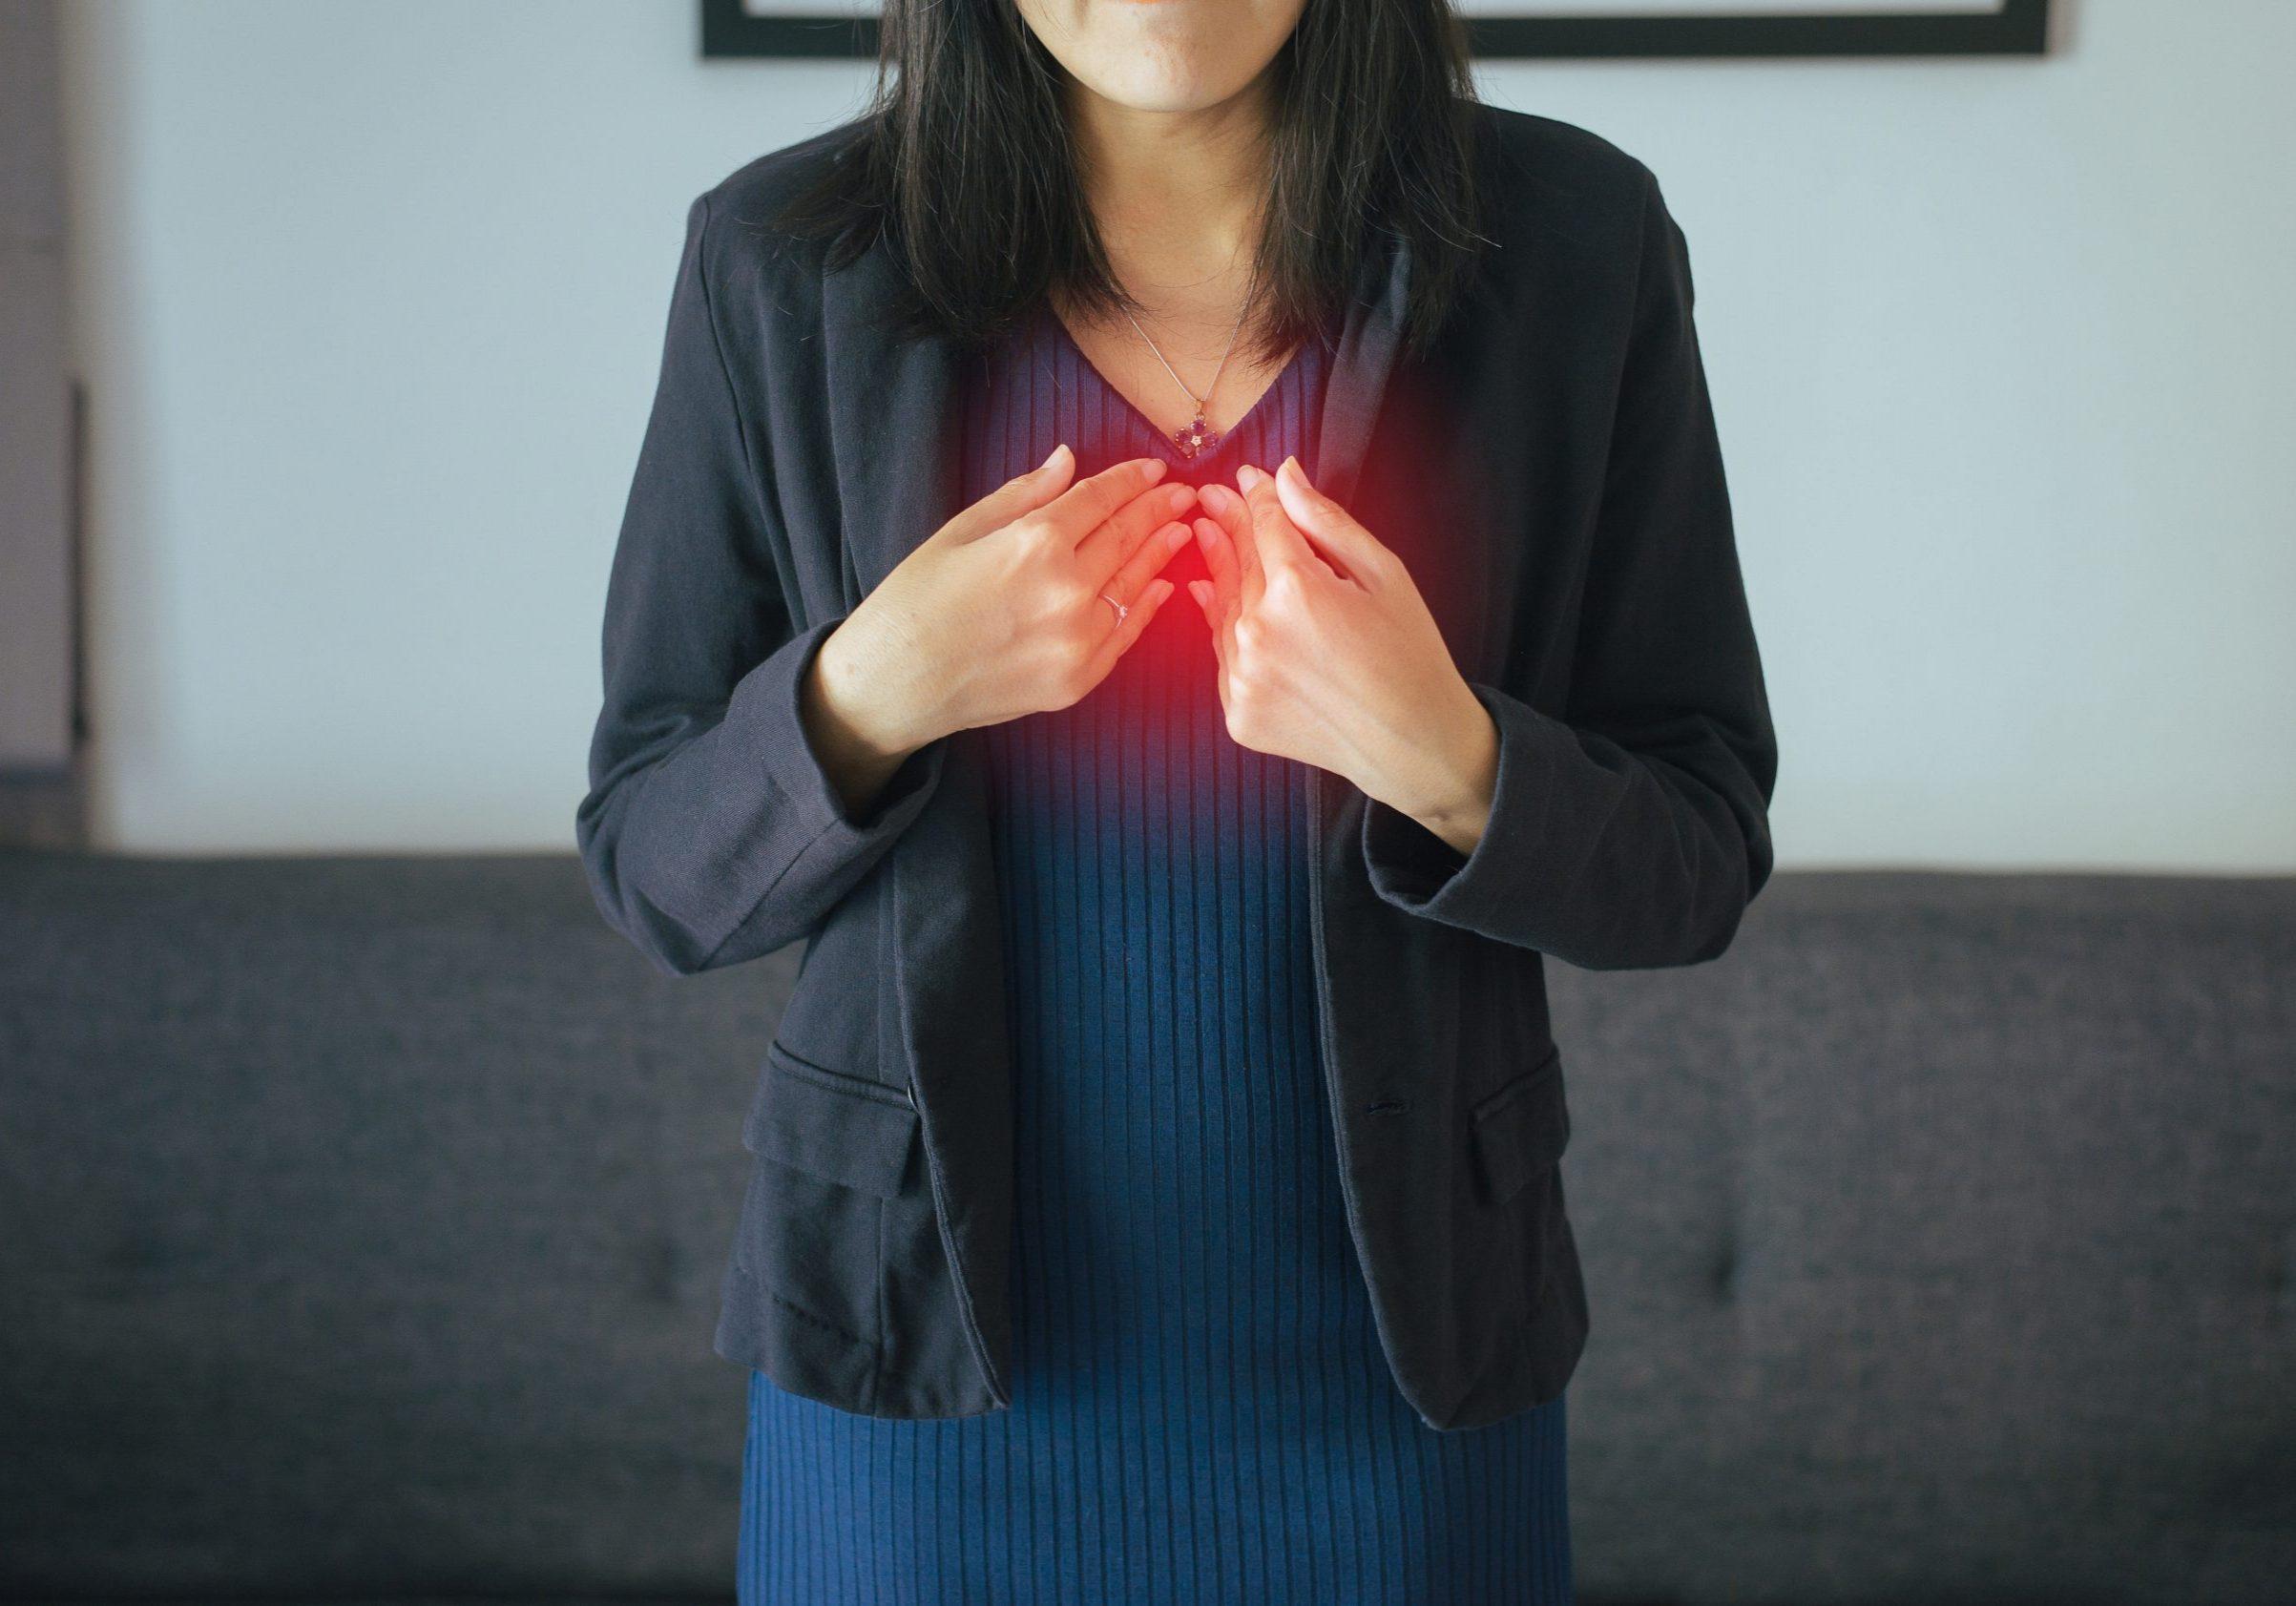 Asian woman having or symptomatic reflux acids